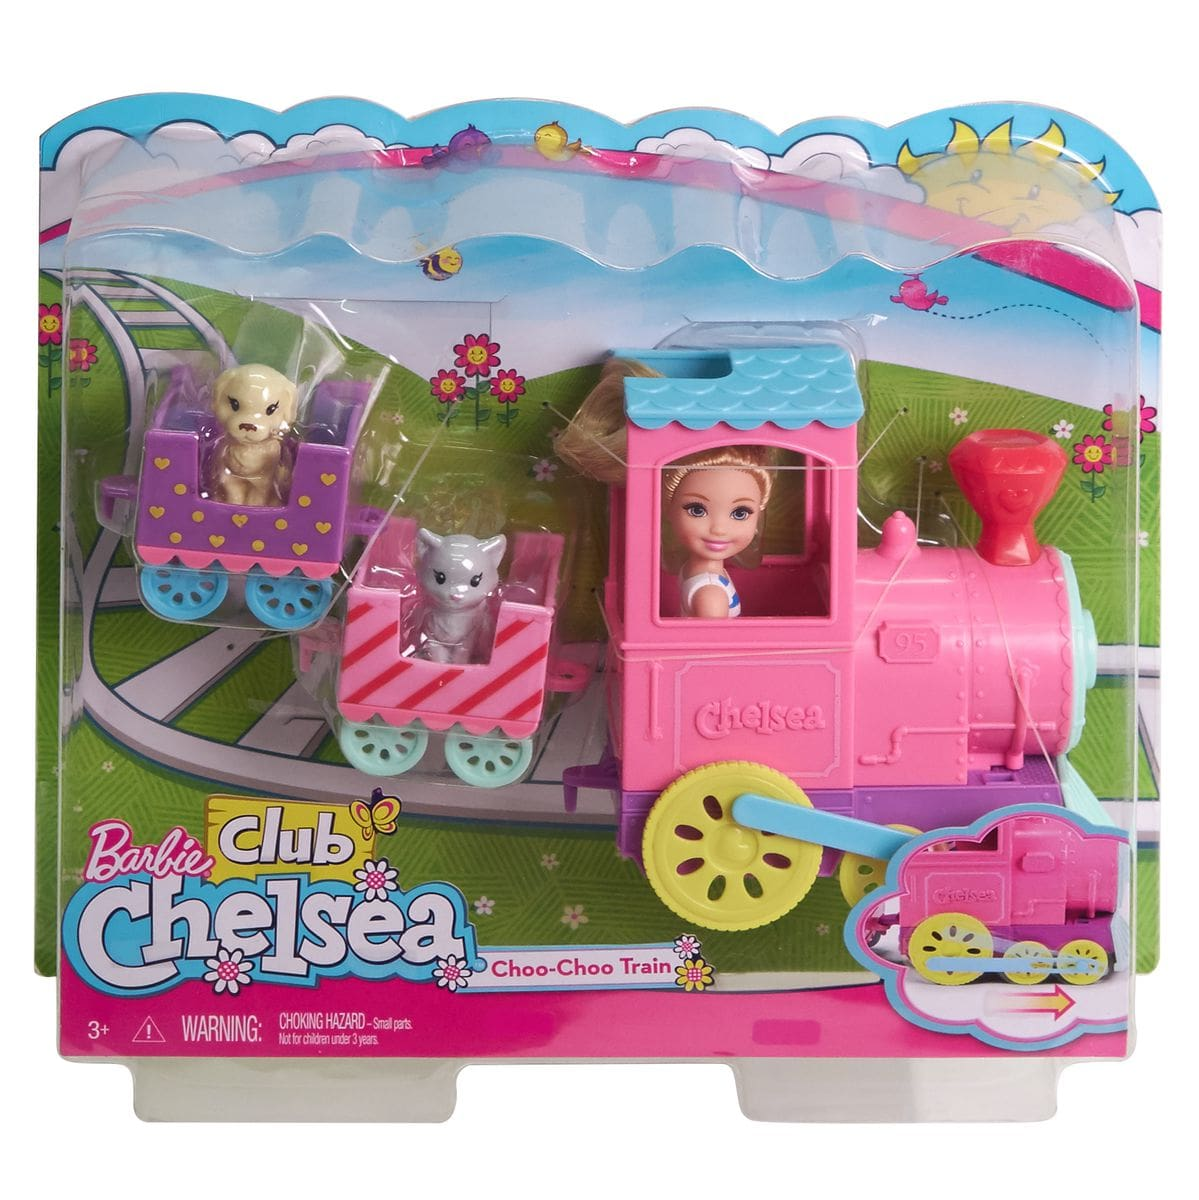 Chelsea Choo-Choo Train Giocattolo